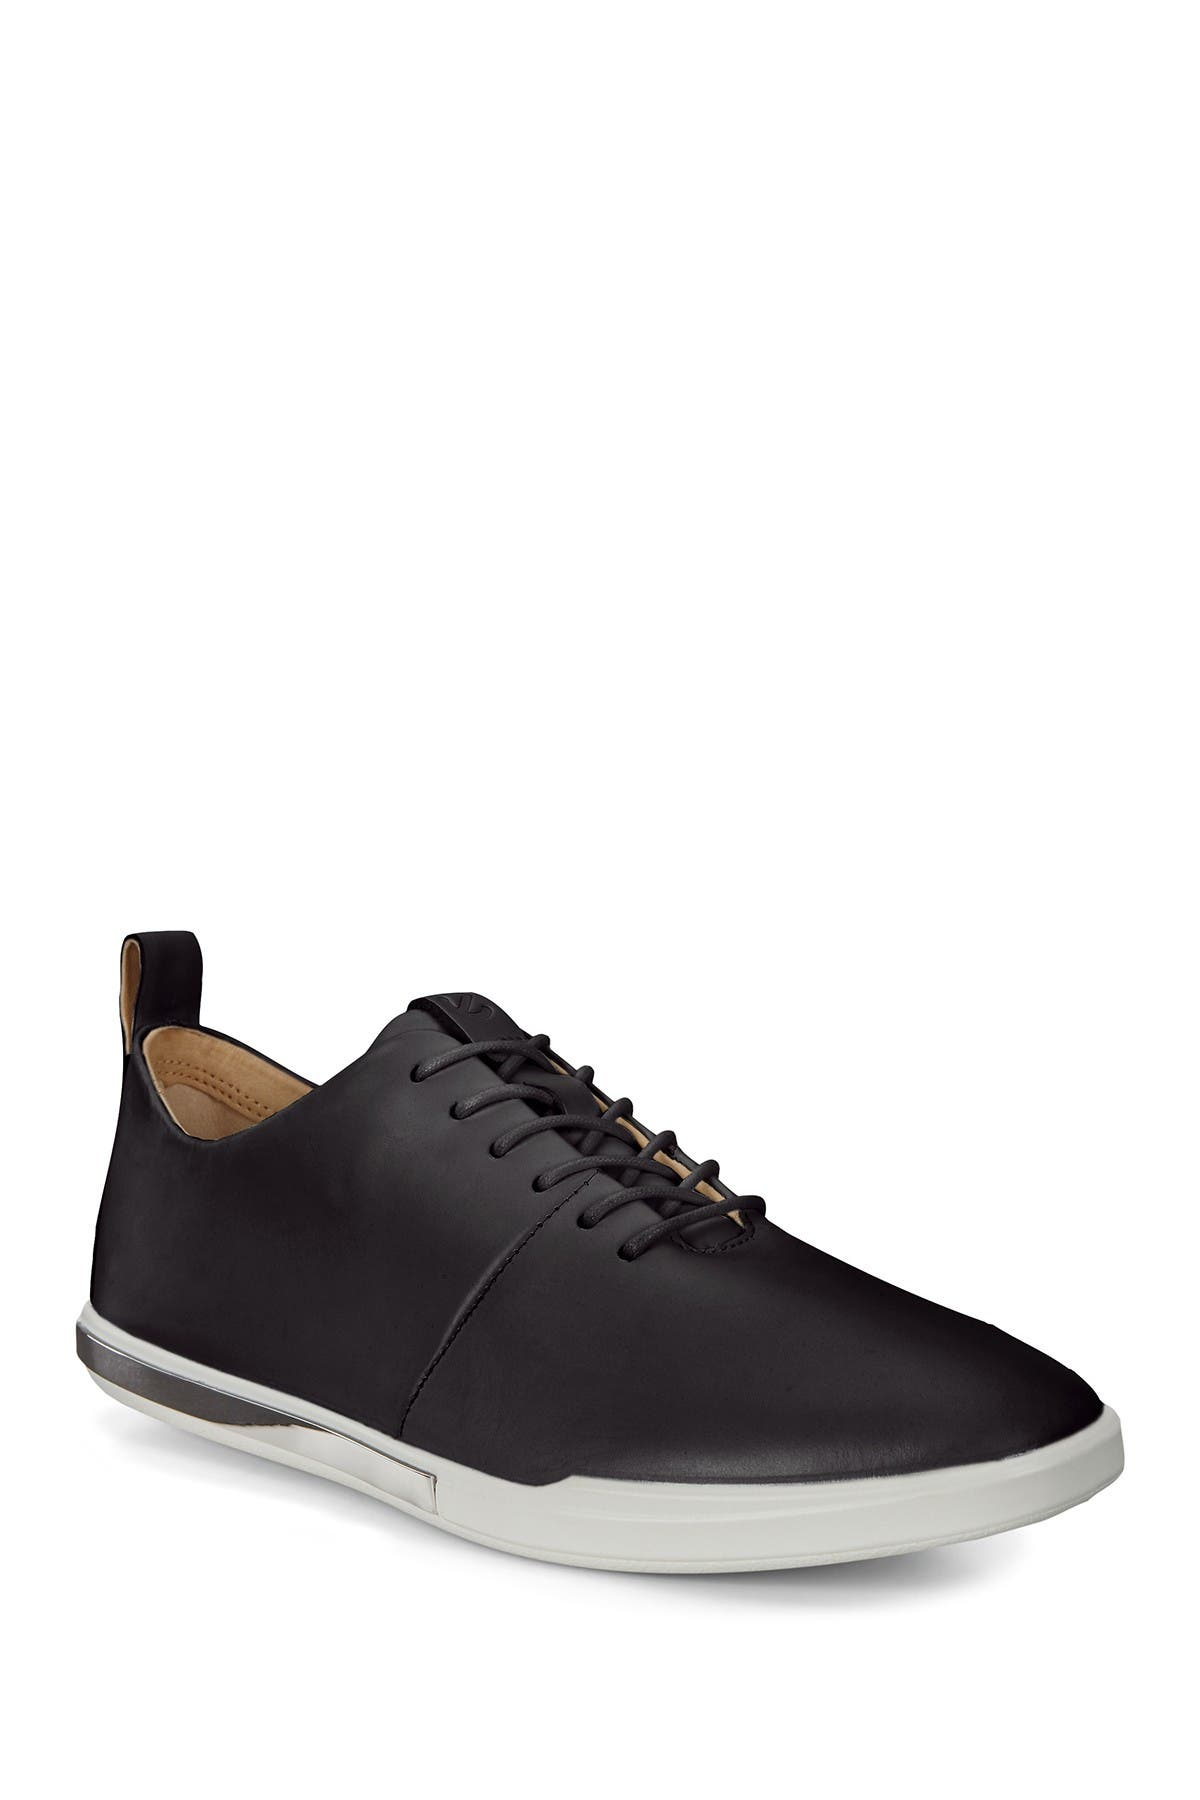 Image of ECCO Simple II Leather Sneaker